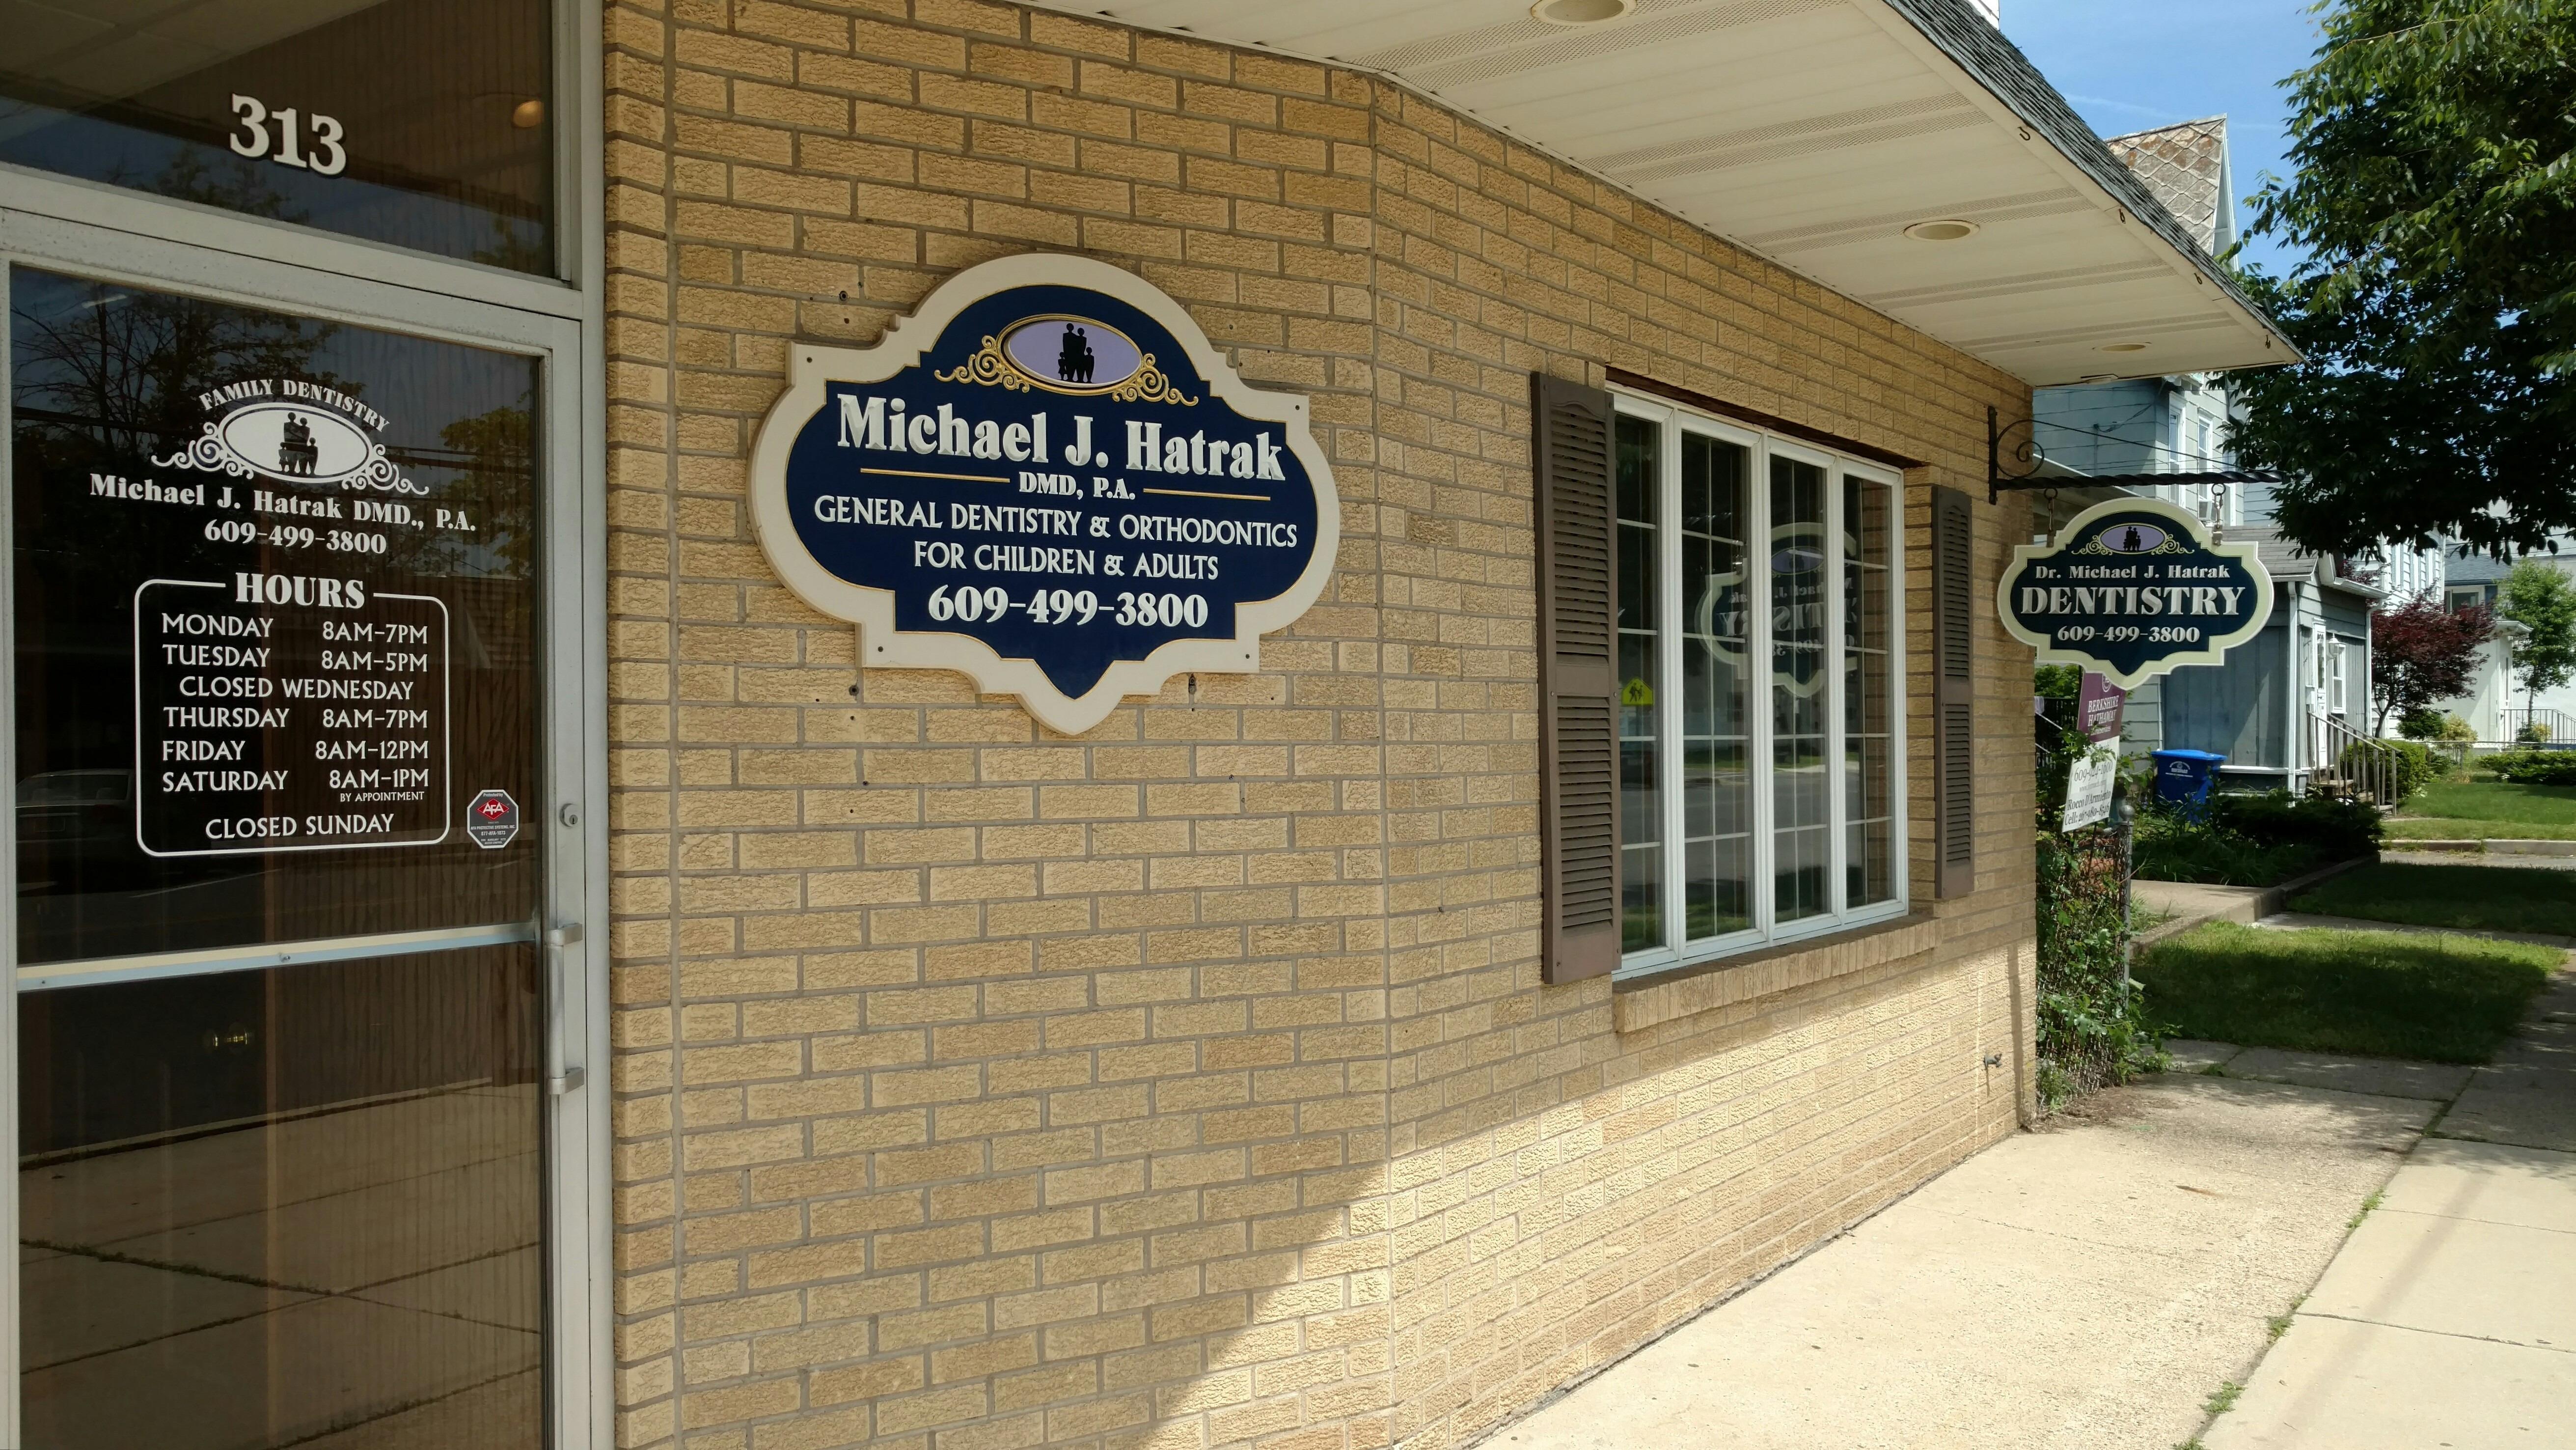 Michael J. Hatrak DMD, PA image 6